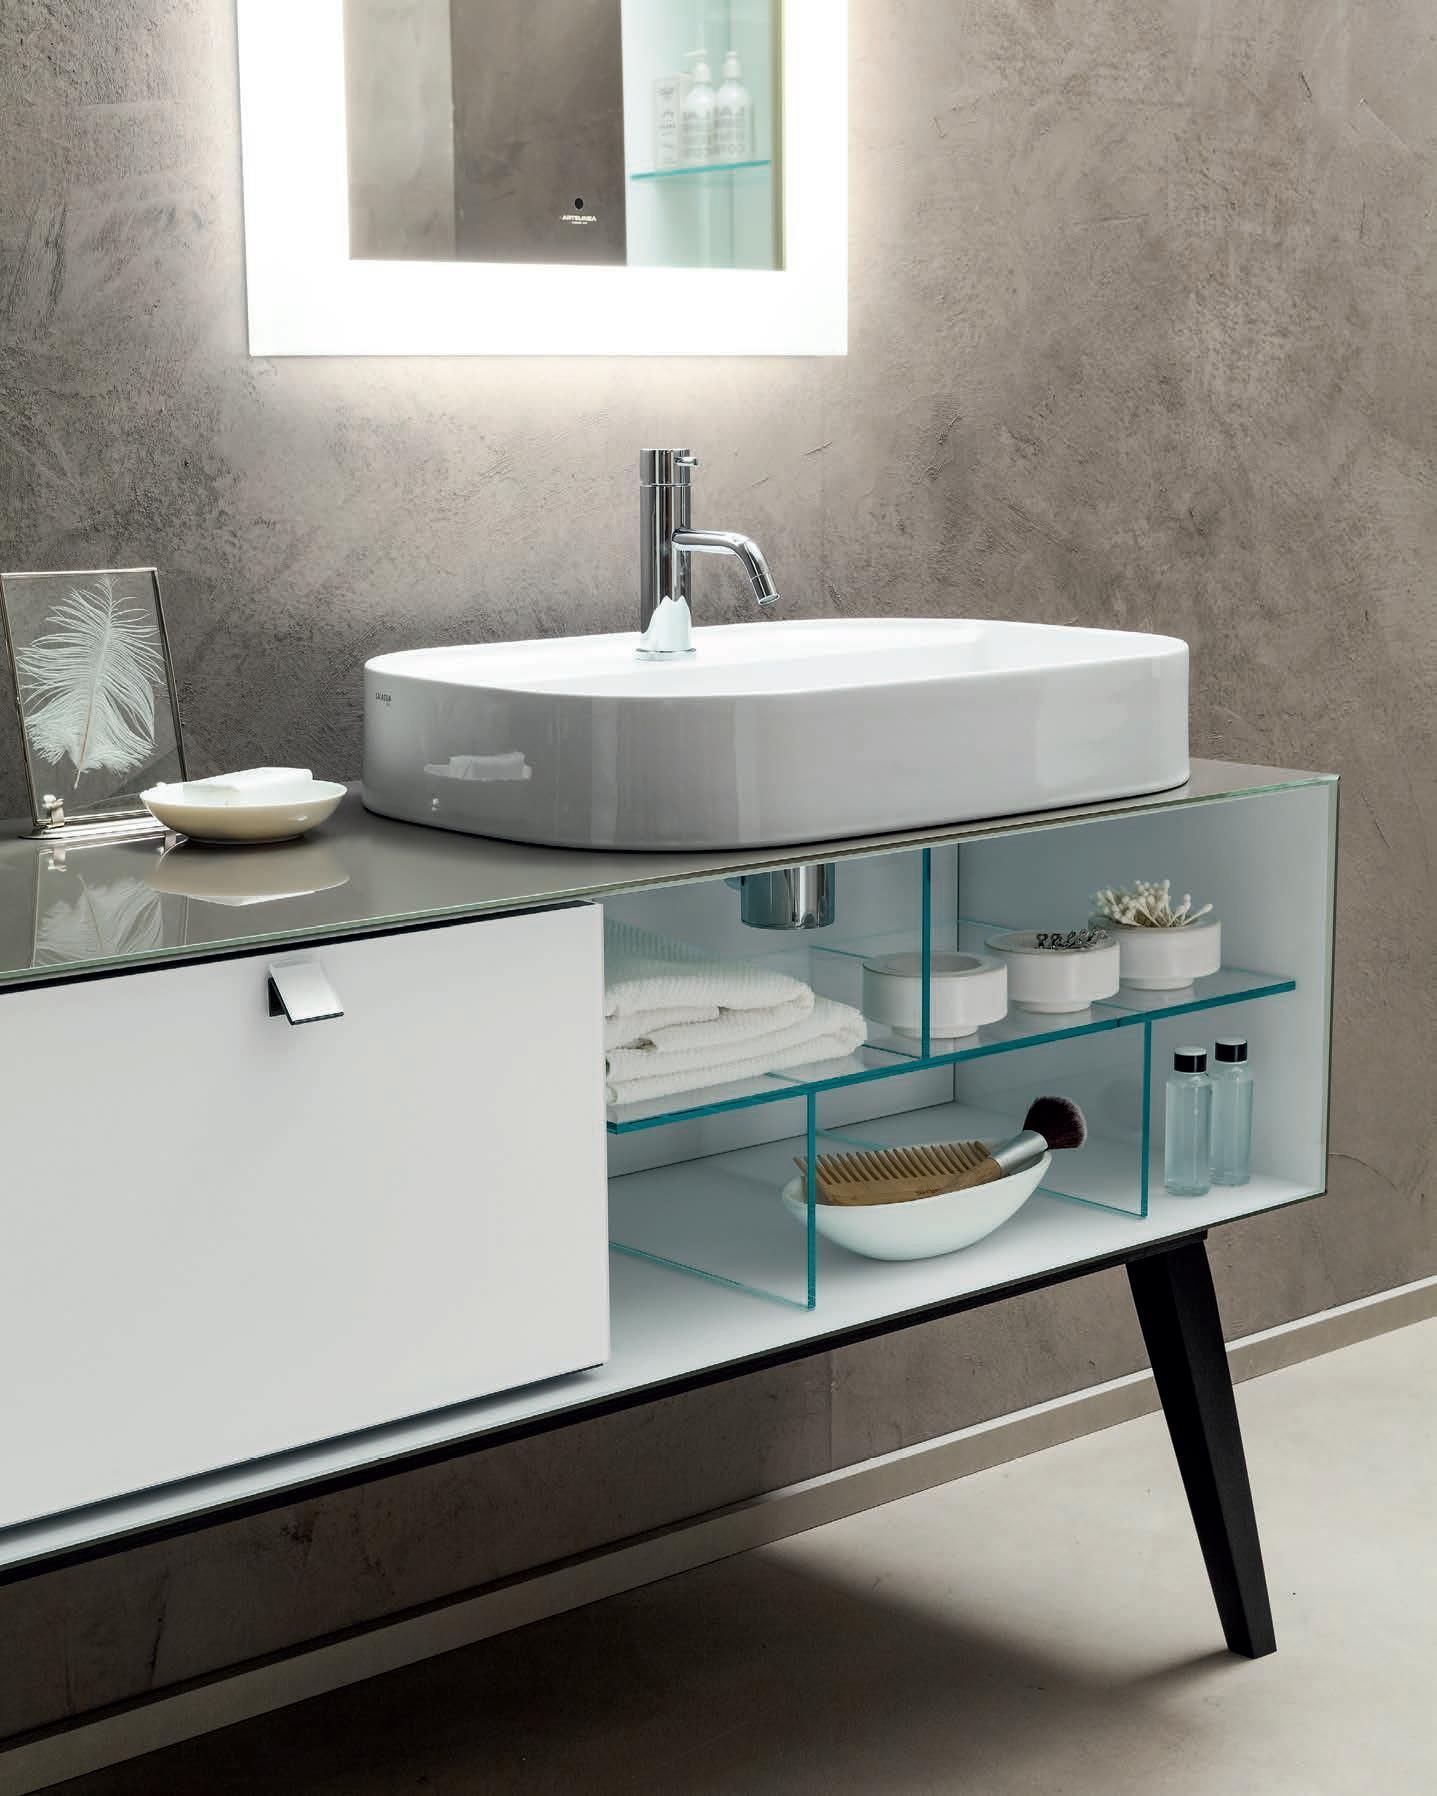 fliesen sanit re badeinrichtung s dtirol dama. Black Bedroom Furniture Sets. Home Design Ideas